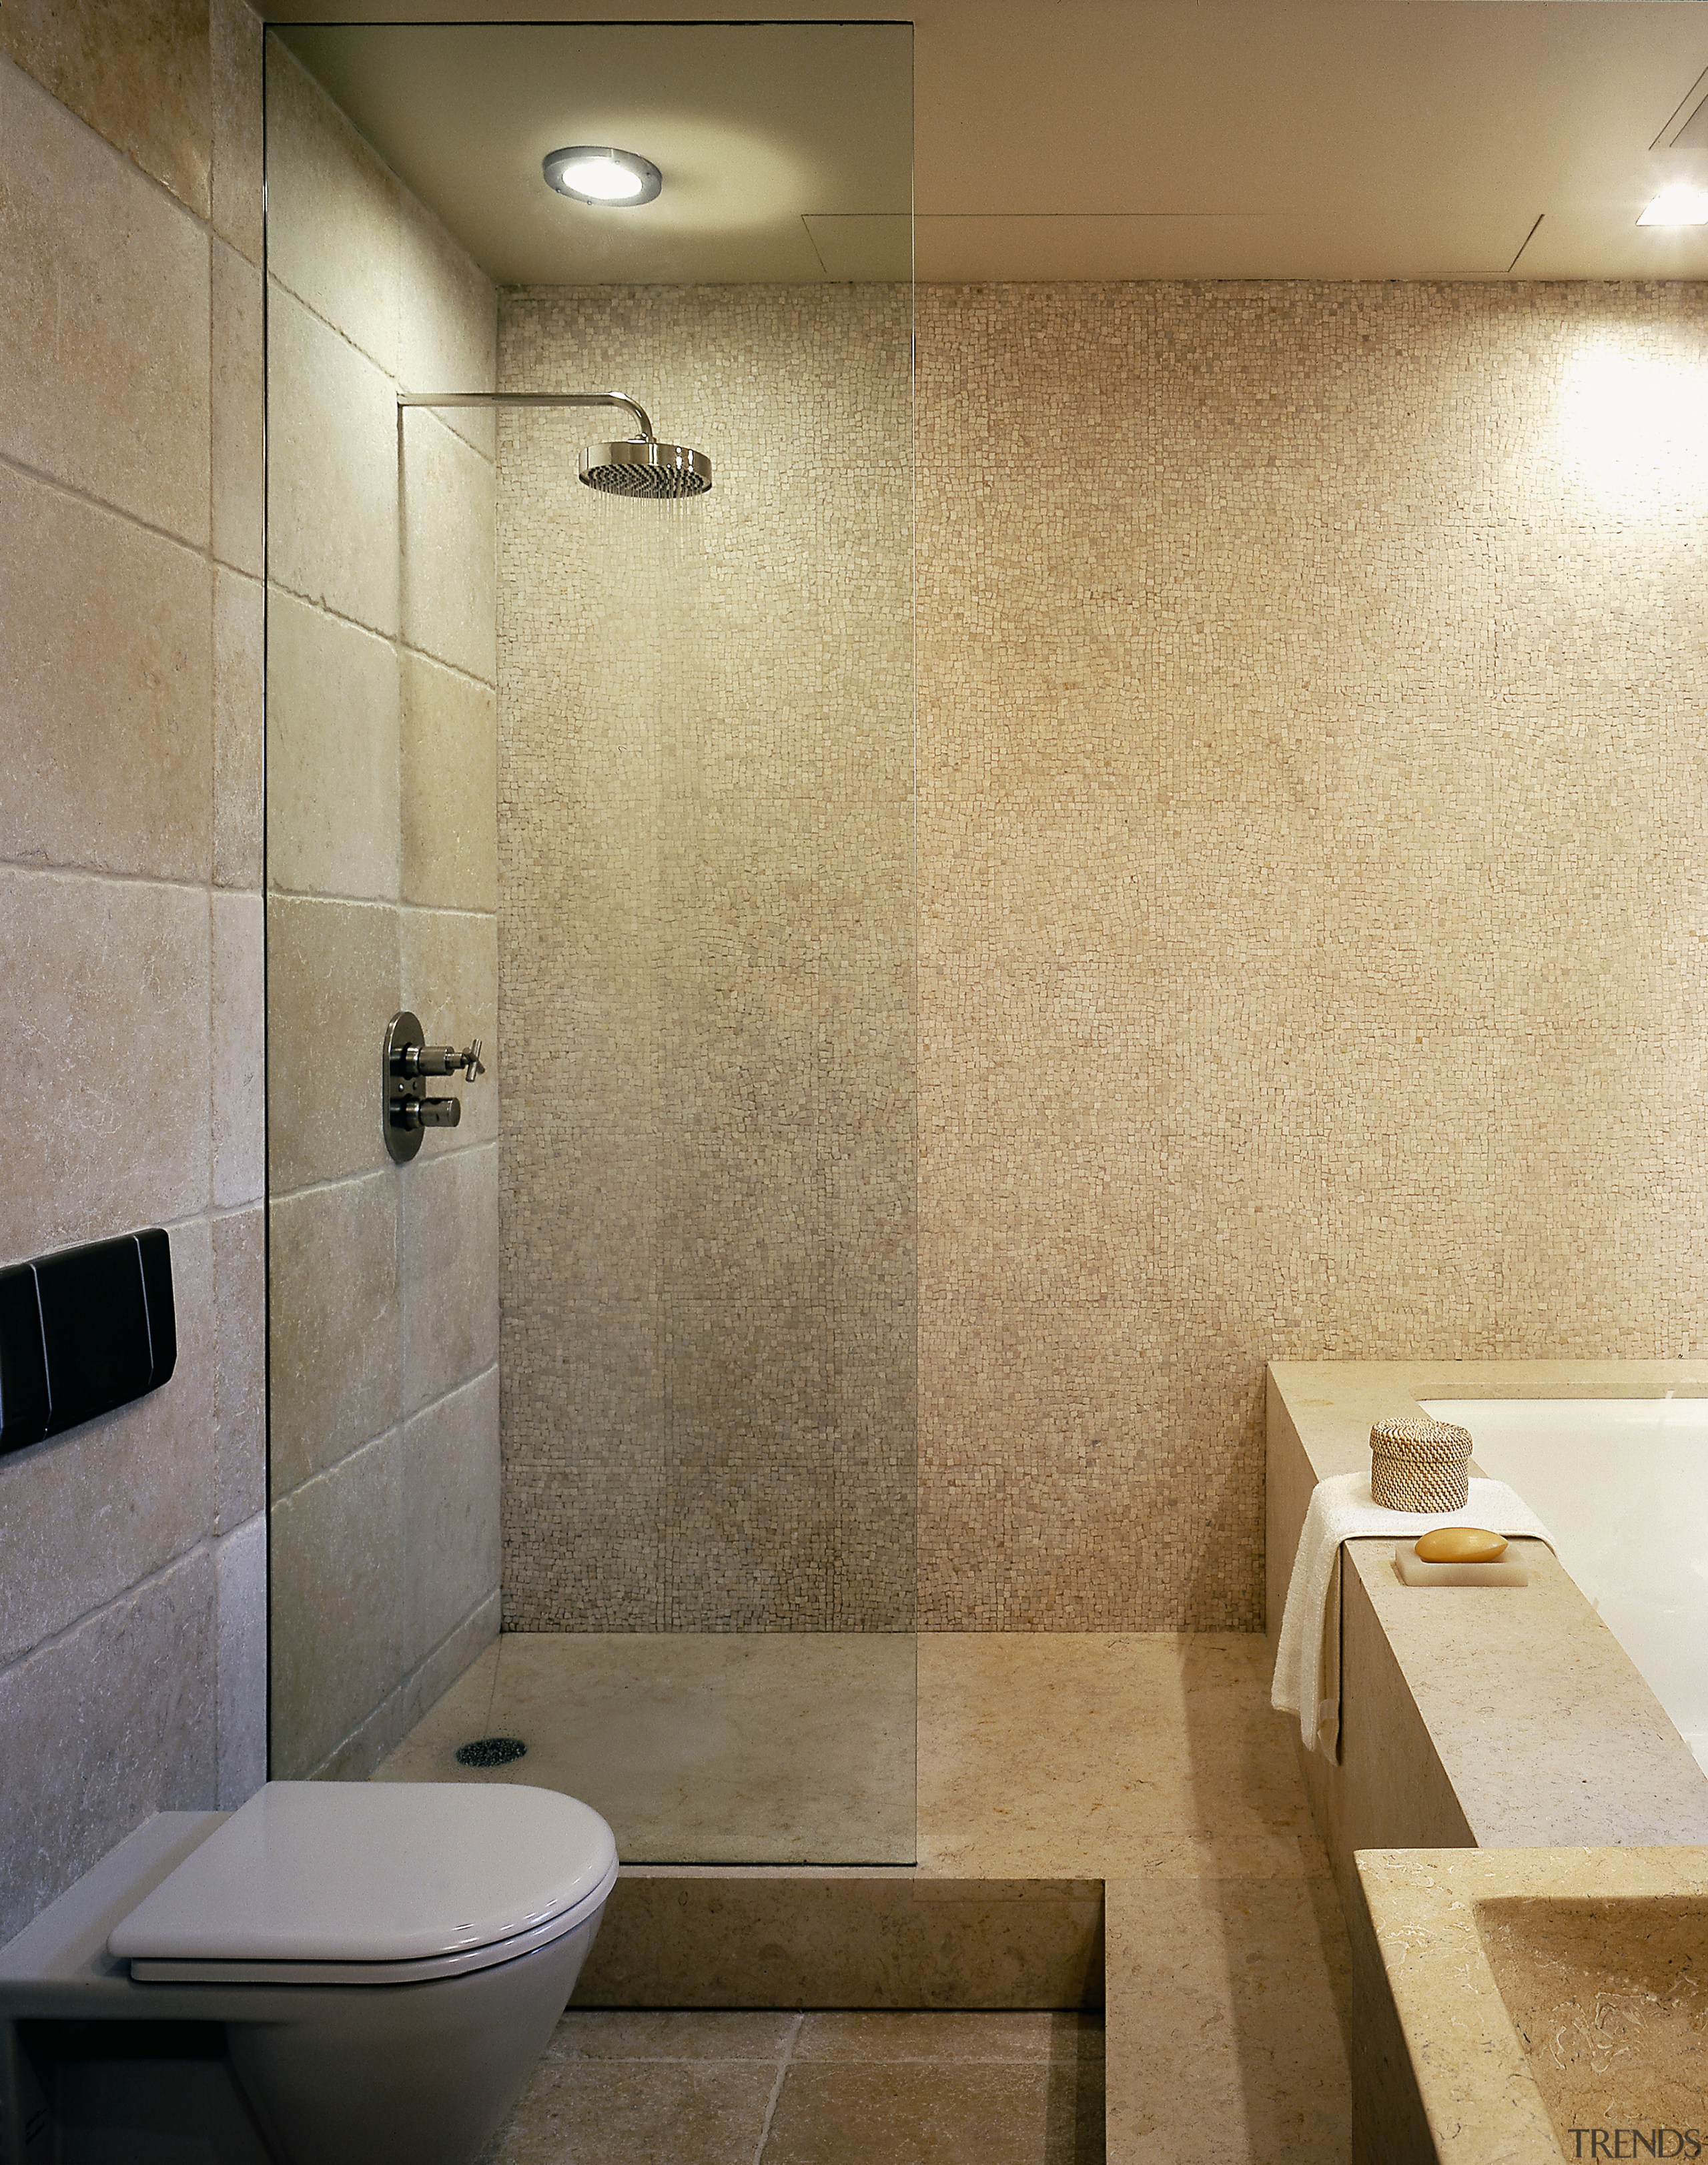 View of this bathroom featuring two seater bathtub, bathroom, ceiling, ceramic, floor, flooring, interior design, plumbing fixture, product design, room, tile, wall, brown, orange